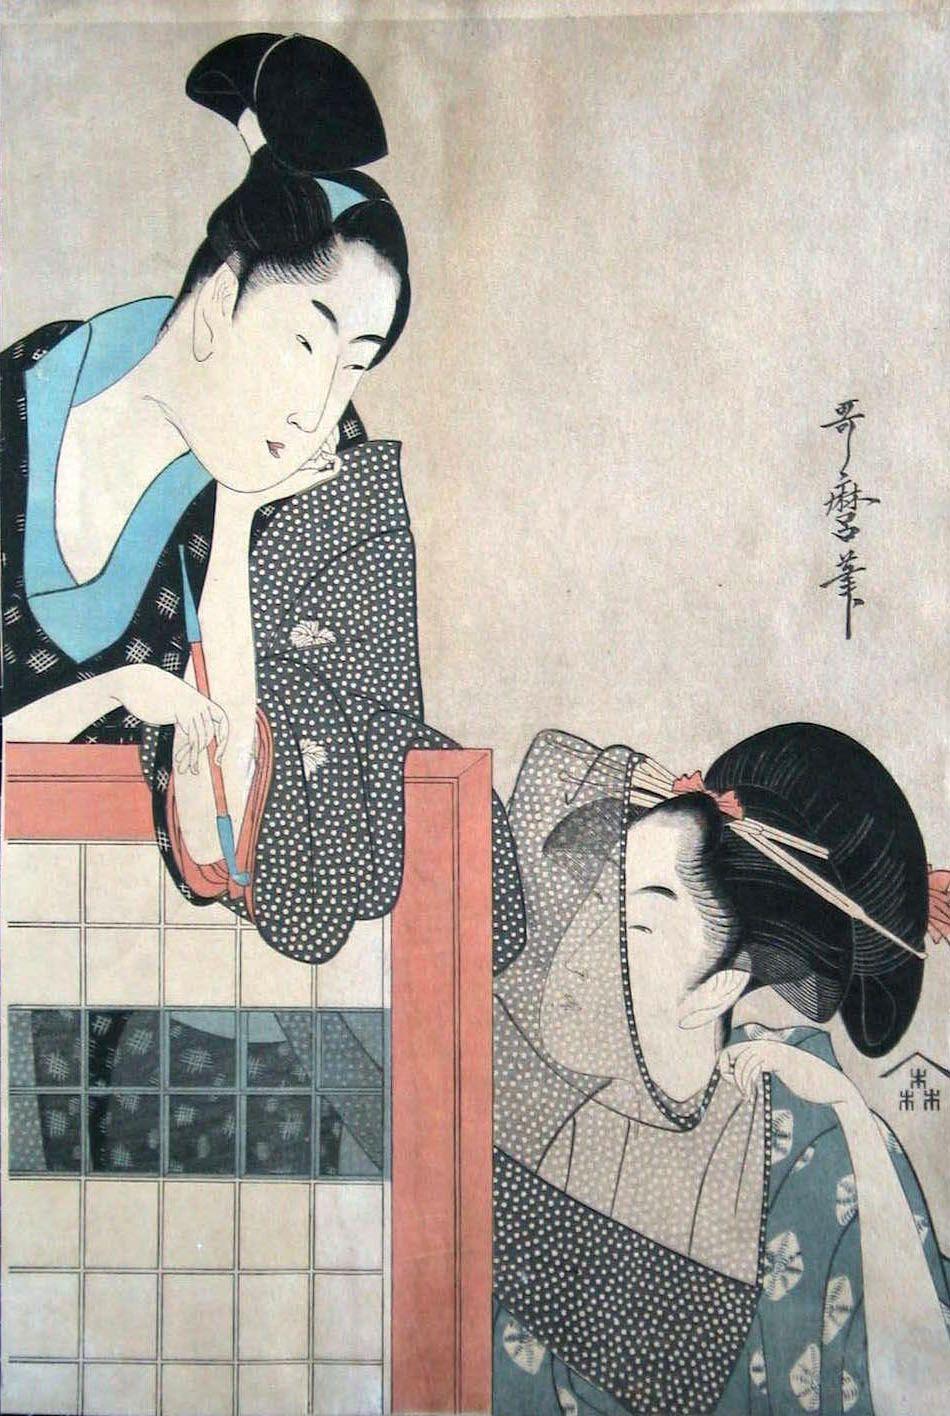 Pareja con biombo. Kitagawa Utamaro, 1797, Edo. Estampa policroma (nishiki-e) sobre papel / MNAD